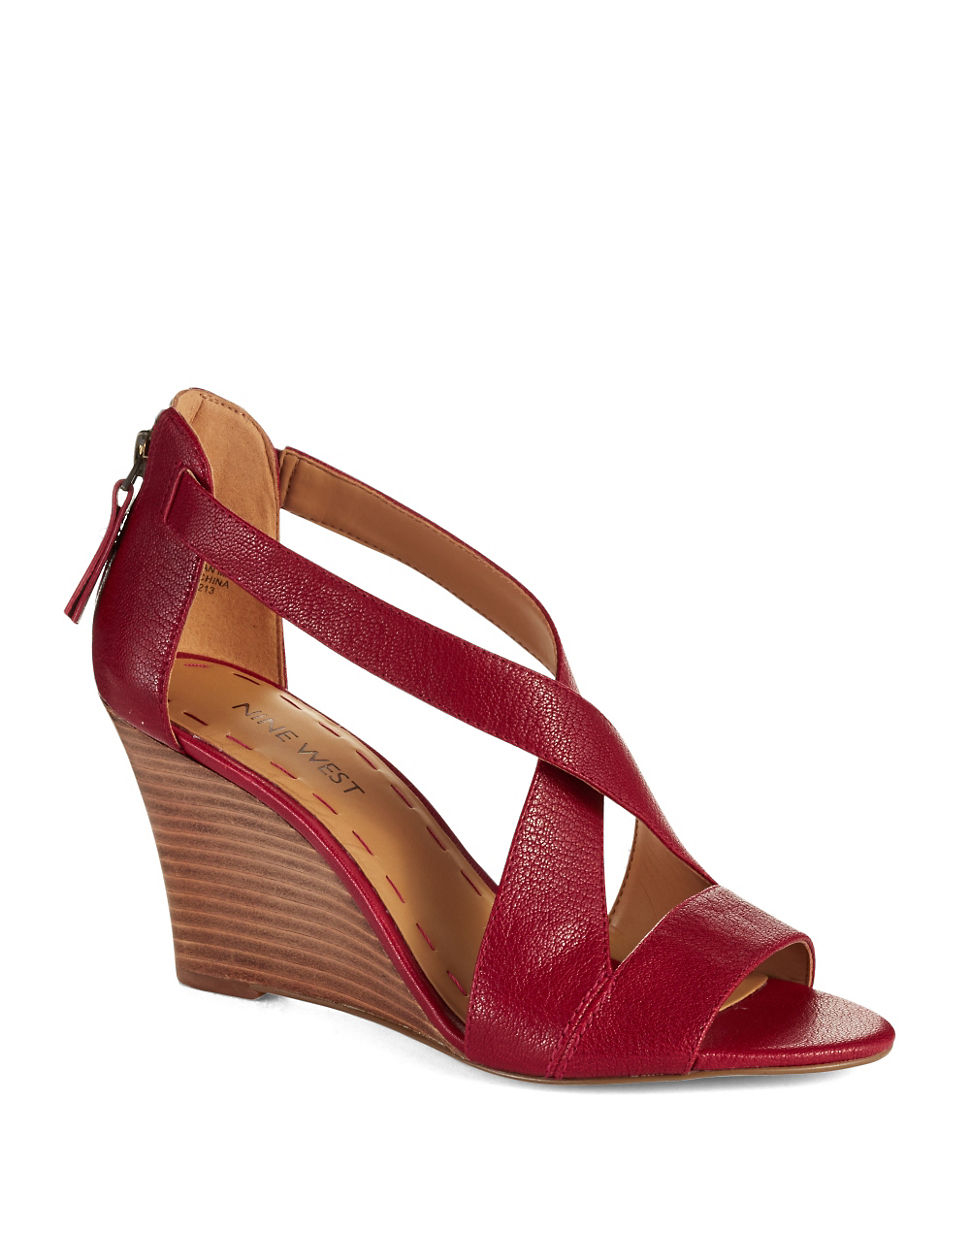 decaef069ad Nine West Fichel Strappy Wedge Sandals in Natural - Lyst